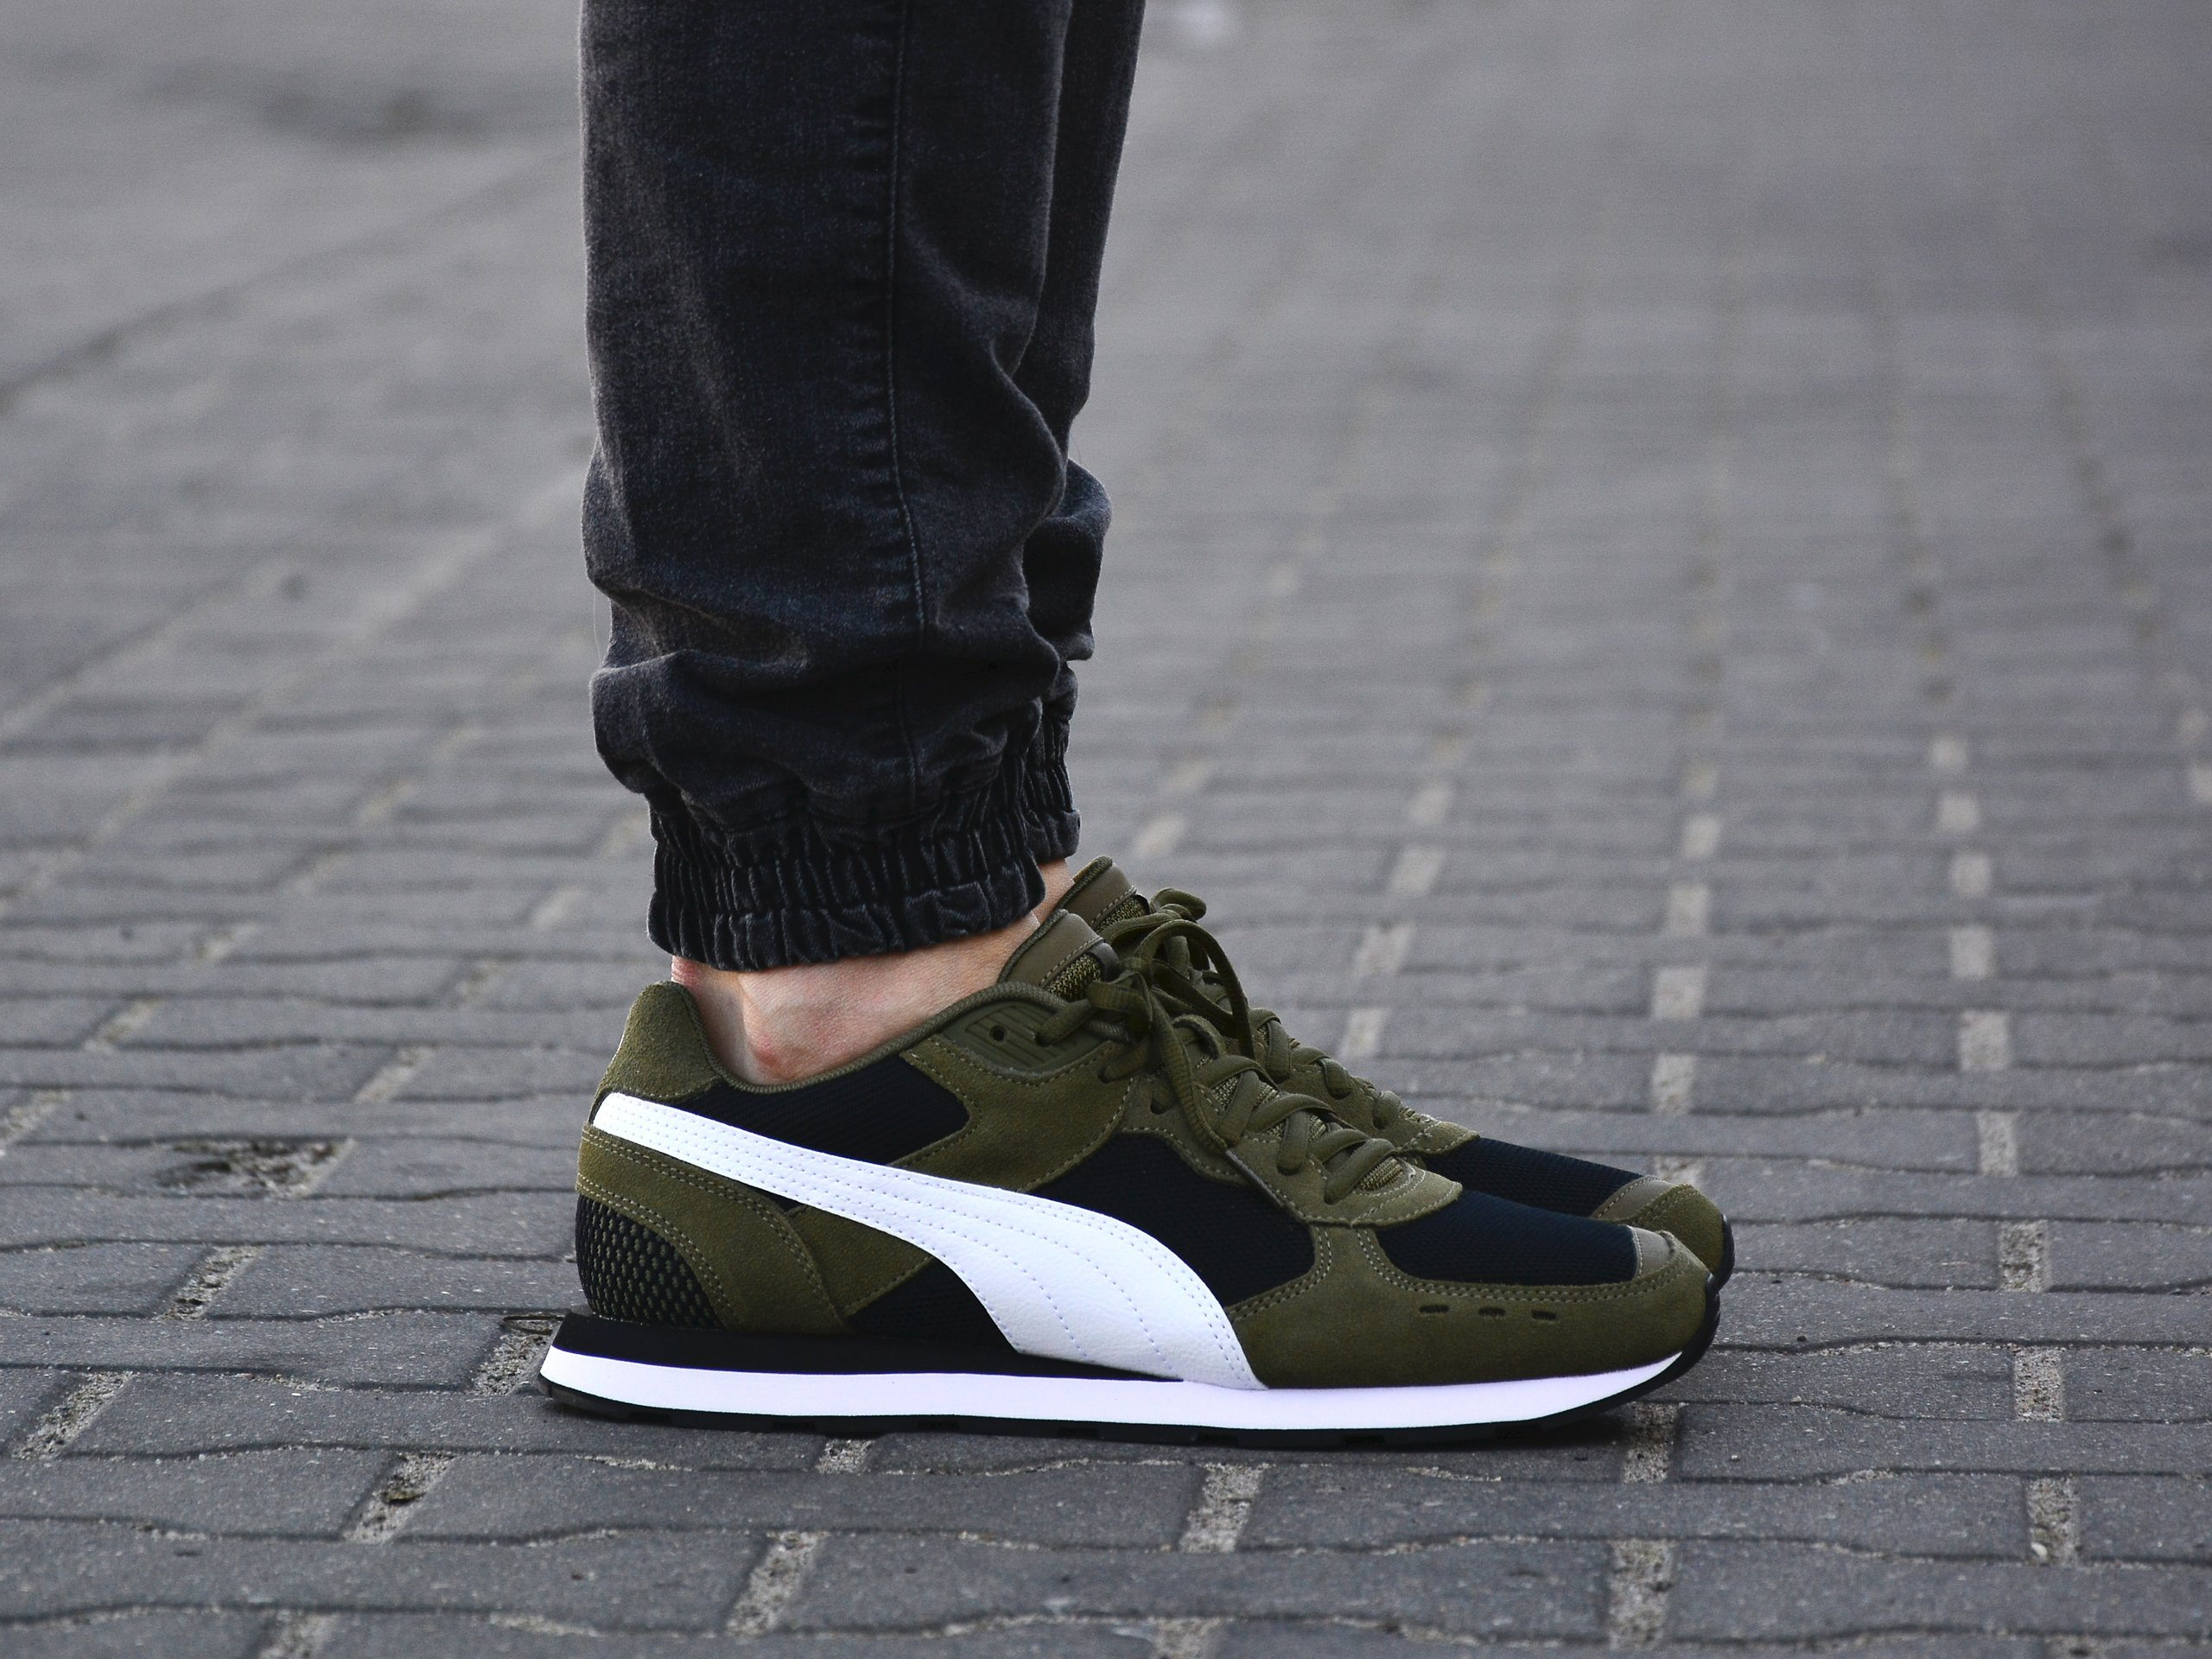 Puma - Vista 369365-08 - Sneakers - Green / Black / White | Mens ...